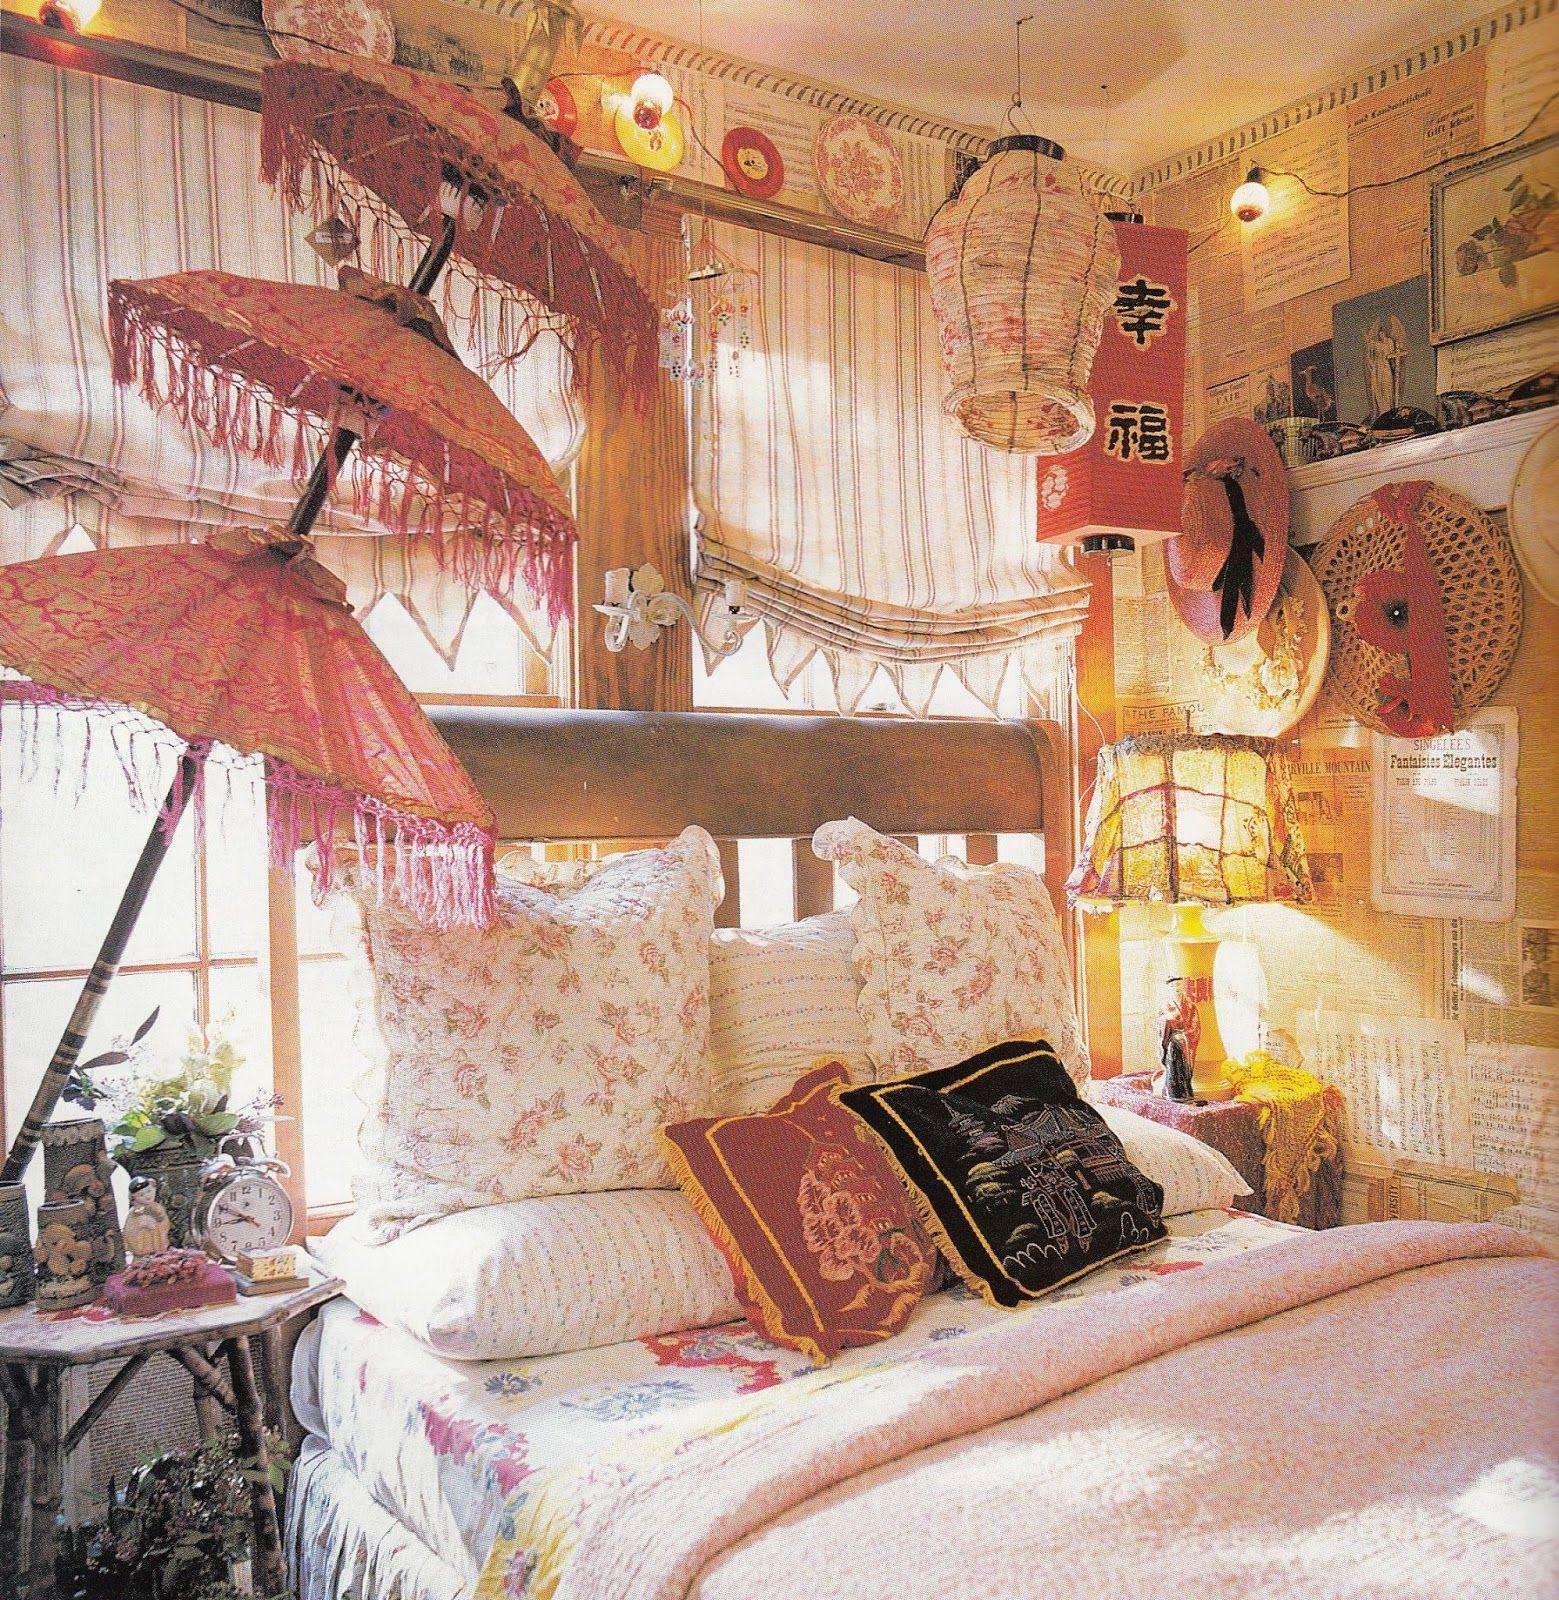 exciting bedroom style bohemian bedding | Babylon Sisters: Bedroom Inspiration | Boho dorm room ...